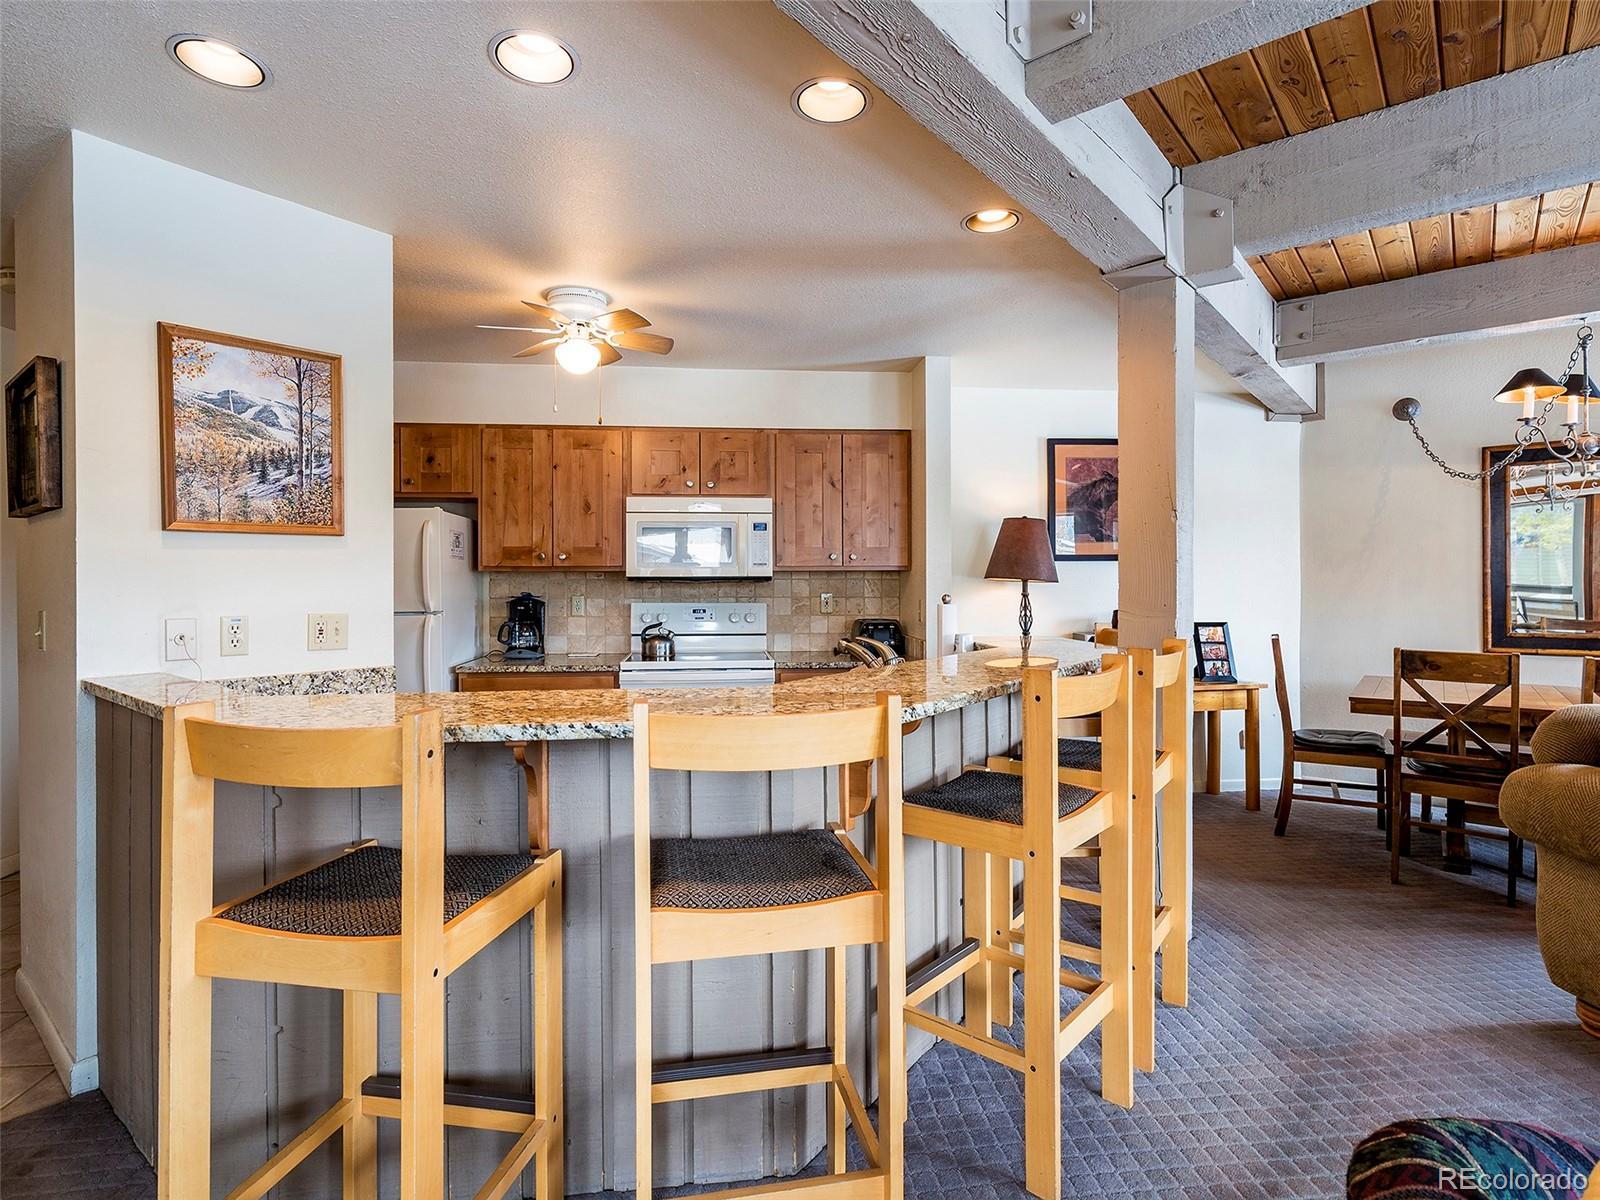 MLS# 4193338 - 5 - 2700 Village Drive #D-204, Steamboat Springs, CO 80487